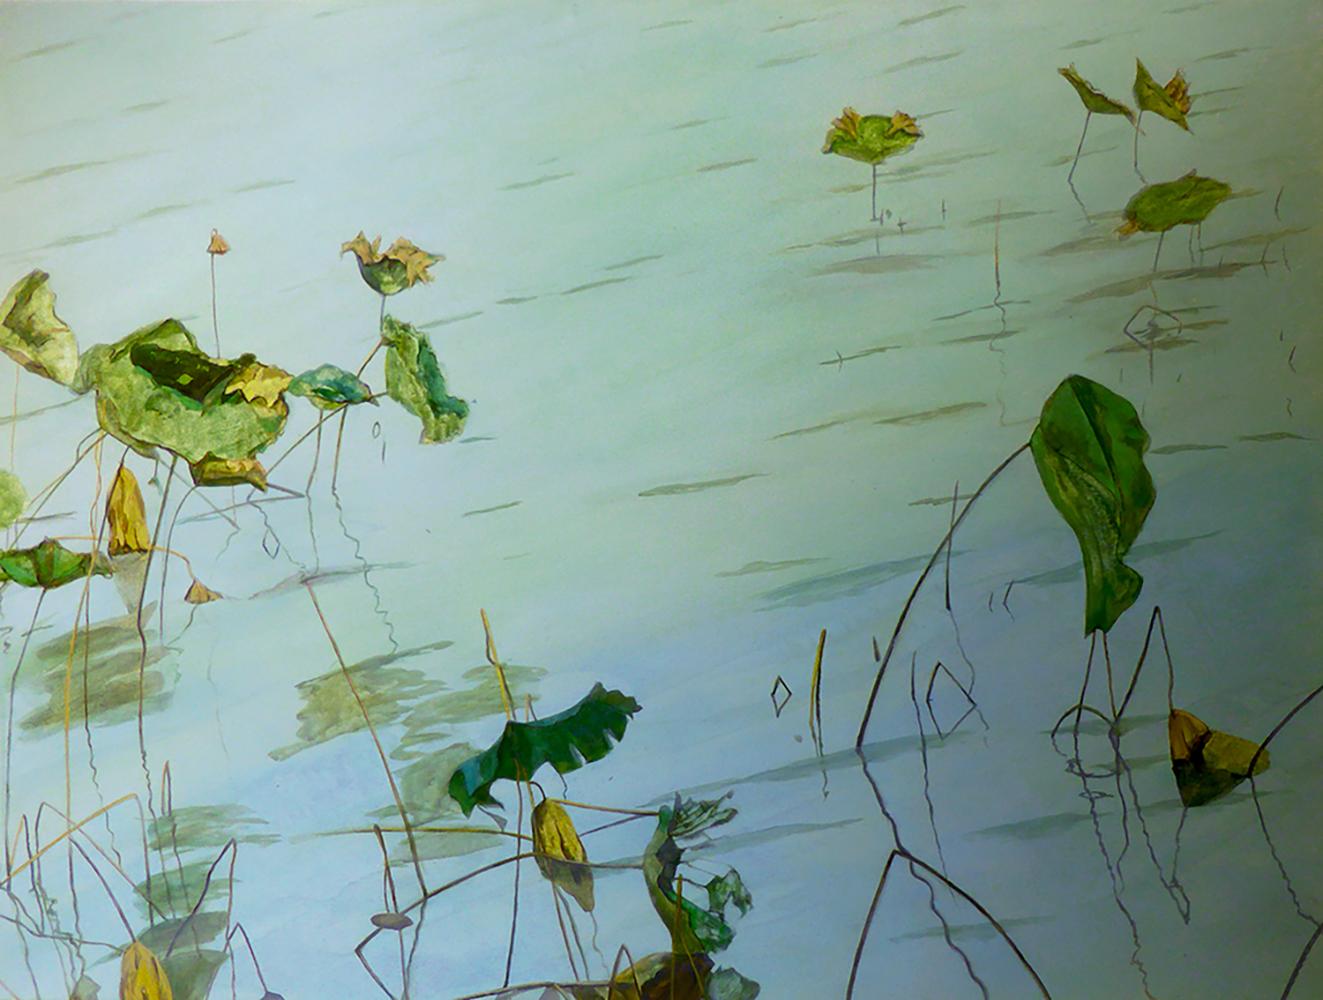 Lotus 02, Oil on Canvas, / 荷,布面油画    92cm x 92cm, 2014